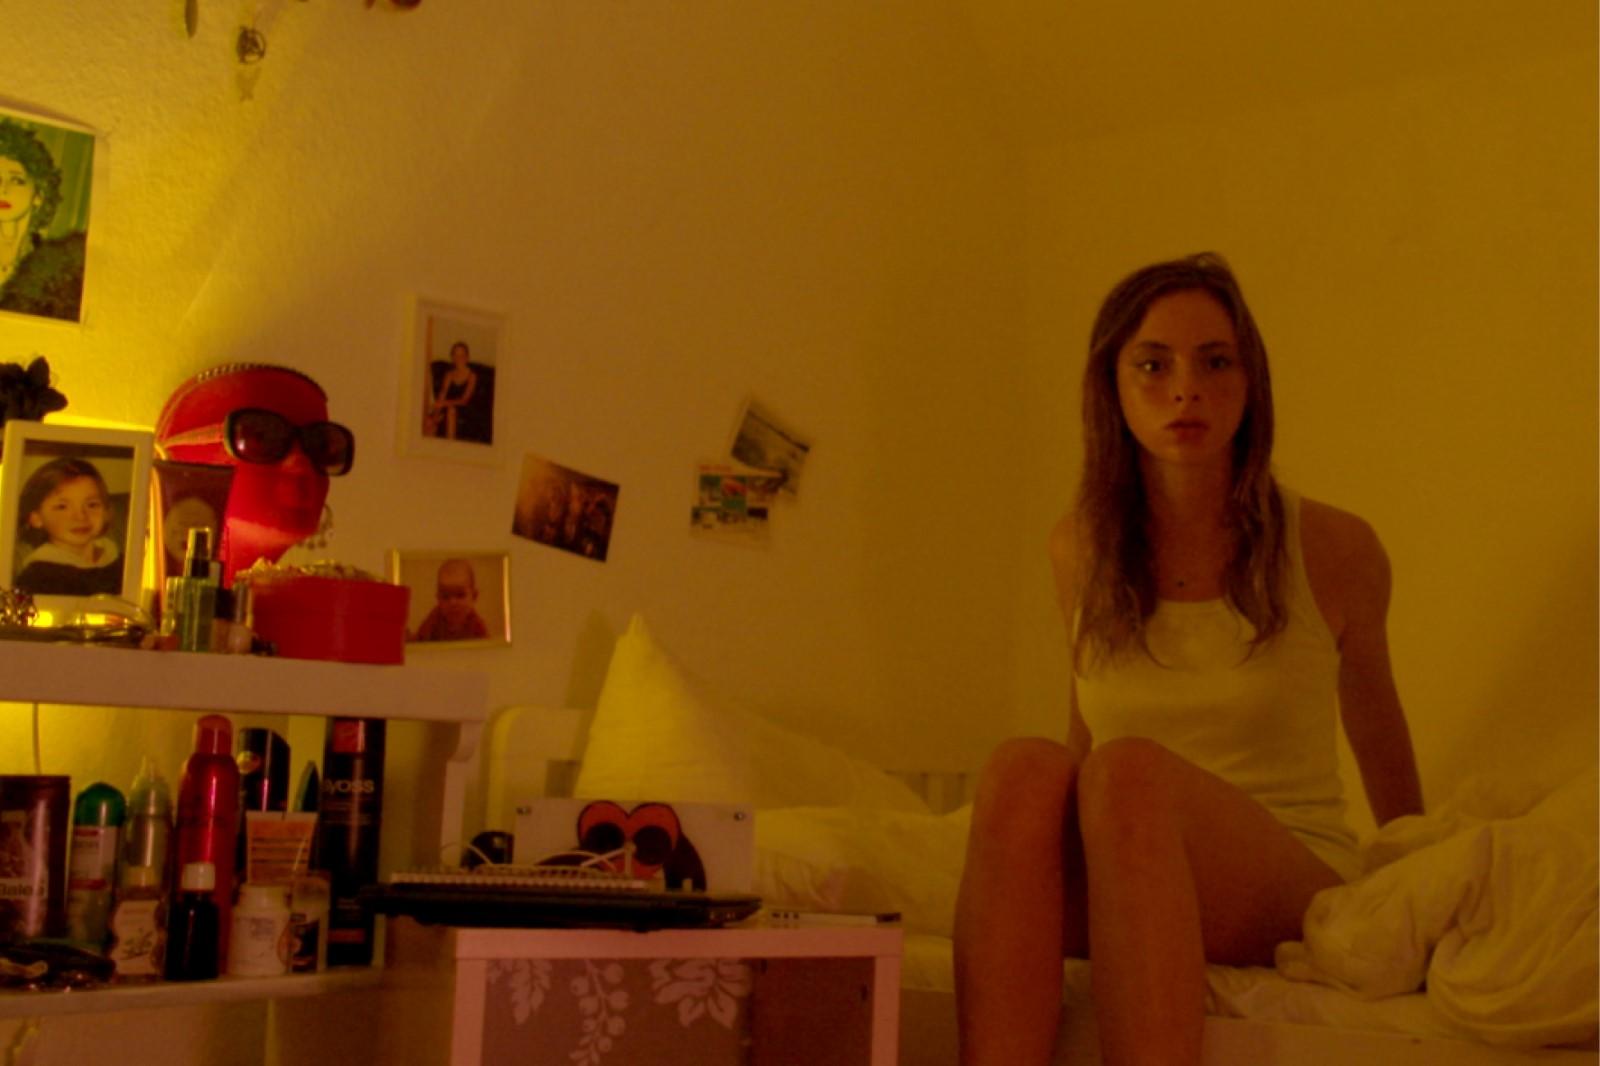 Caroline Peters nackt Nacktbilder & Videos, Sextape